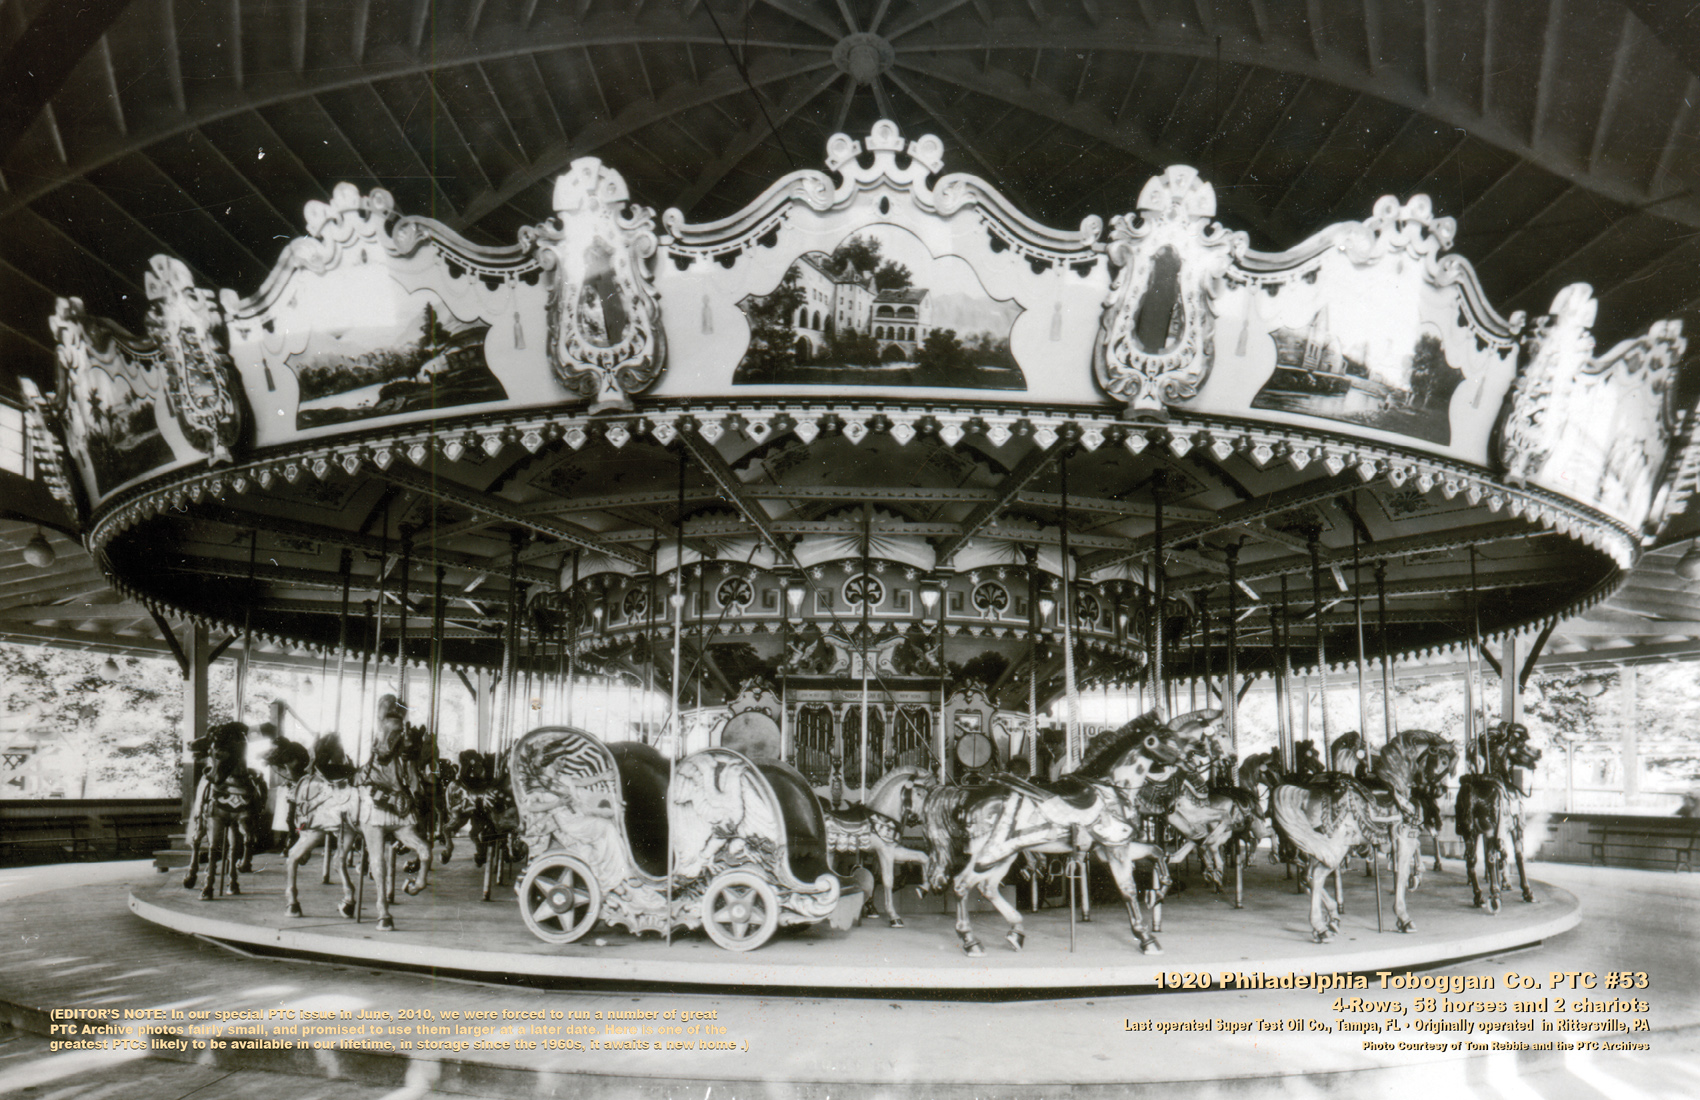 Historic-1920-PTC-53-carousel-CNT-center-Nov-Dec-13